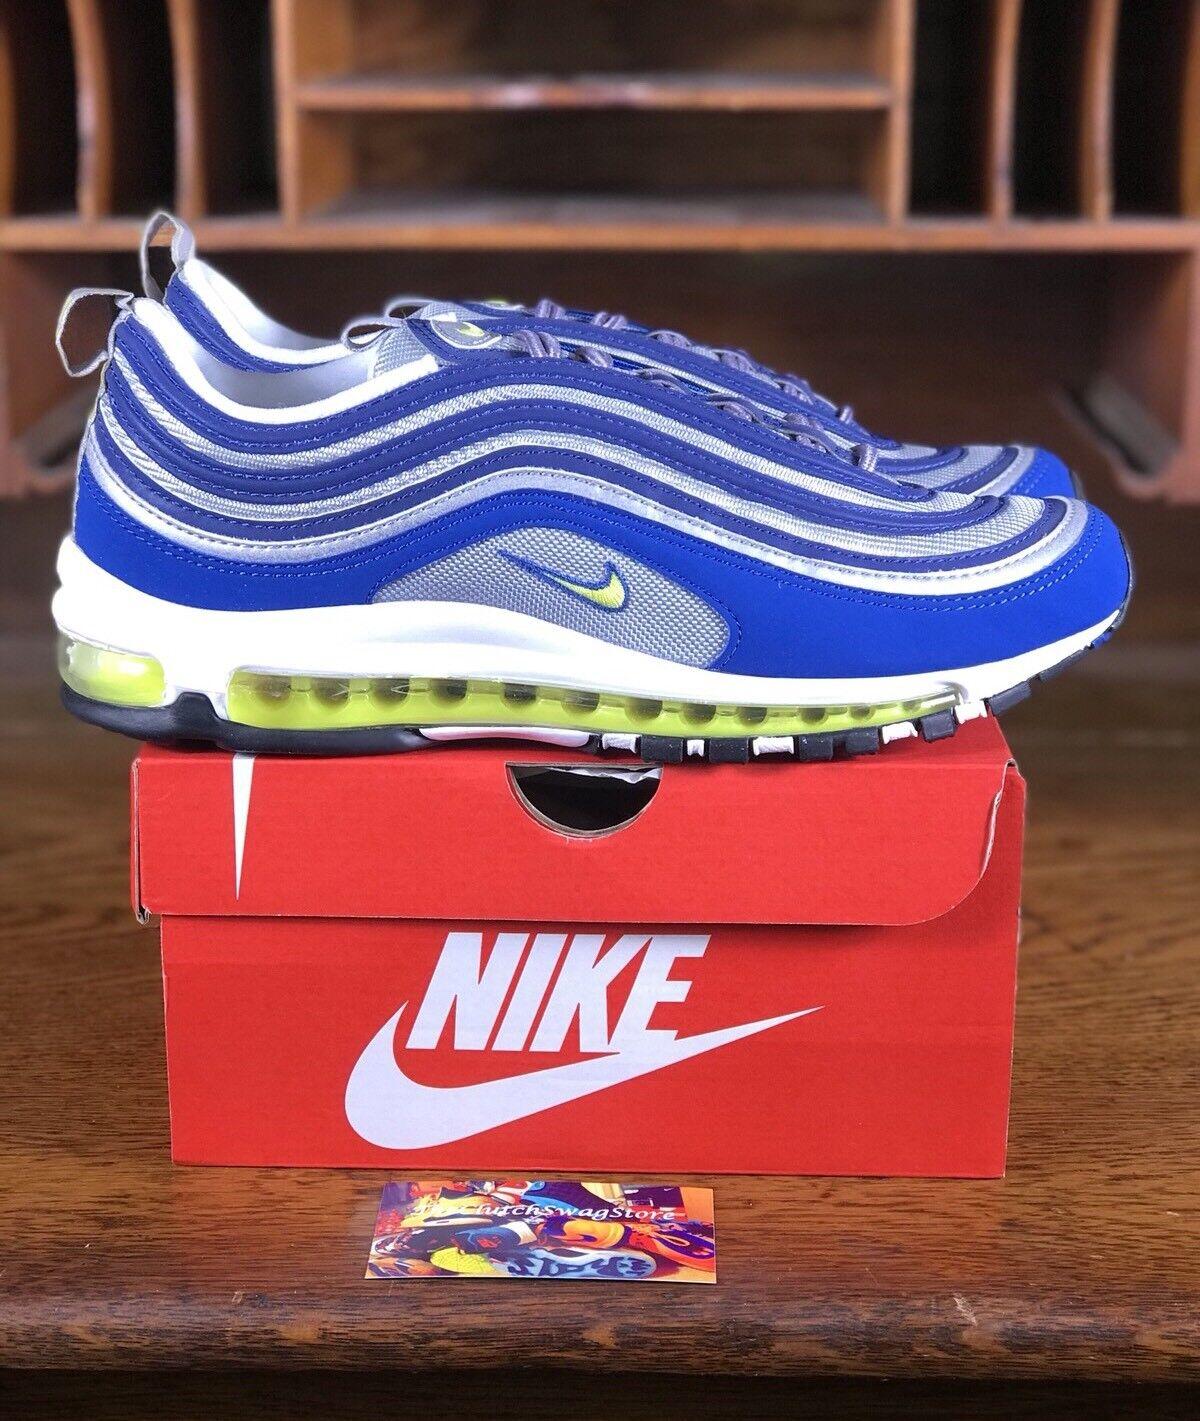 Nike Air Max 97 Atlantic Blue/Silver/White Mens Running Shoe 921826-401 Szs 8-15